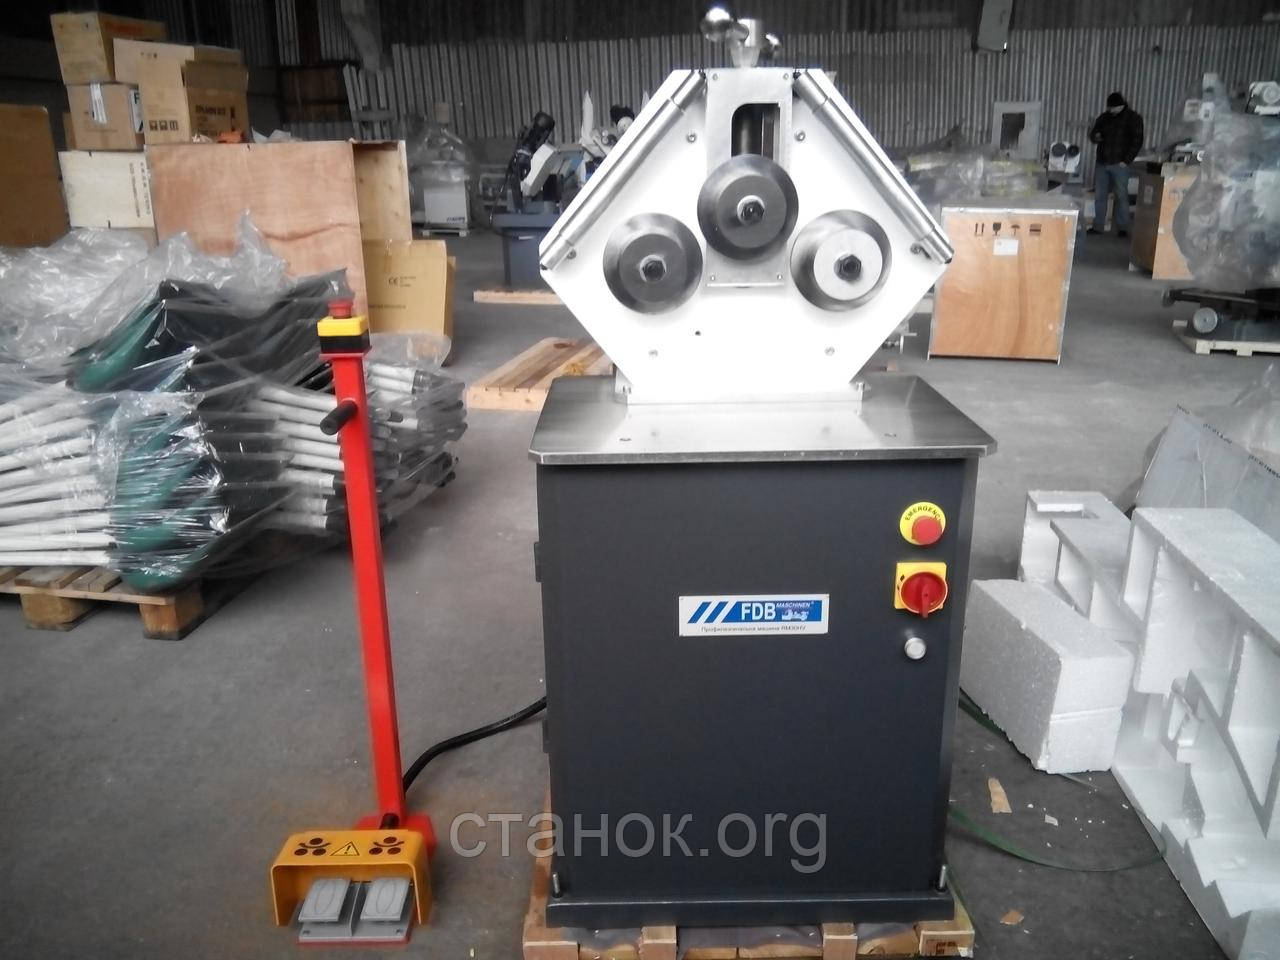 FDB Maschinen RM 30 HV Профилегиб профилегибочный станок по металлу фдб рм 30 шв машинен